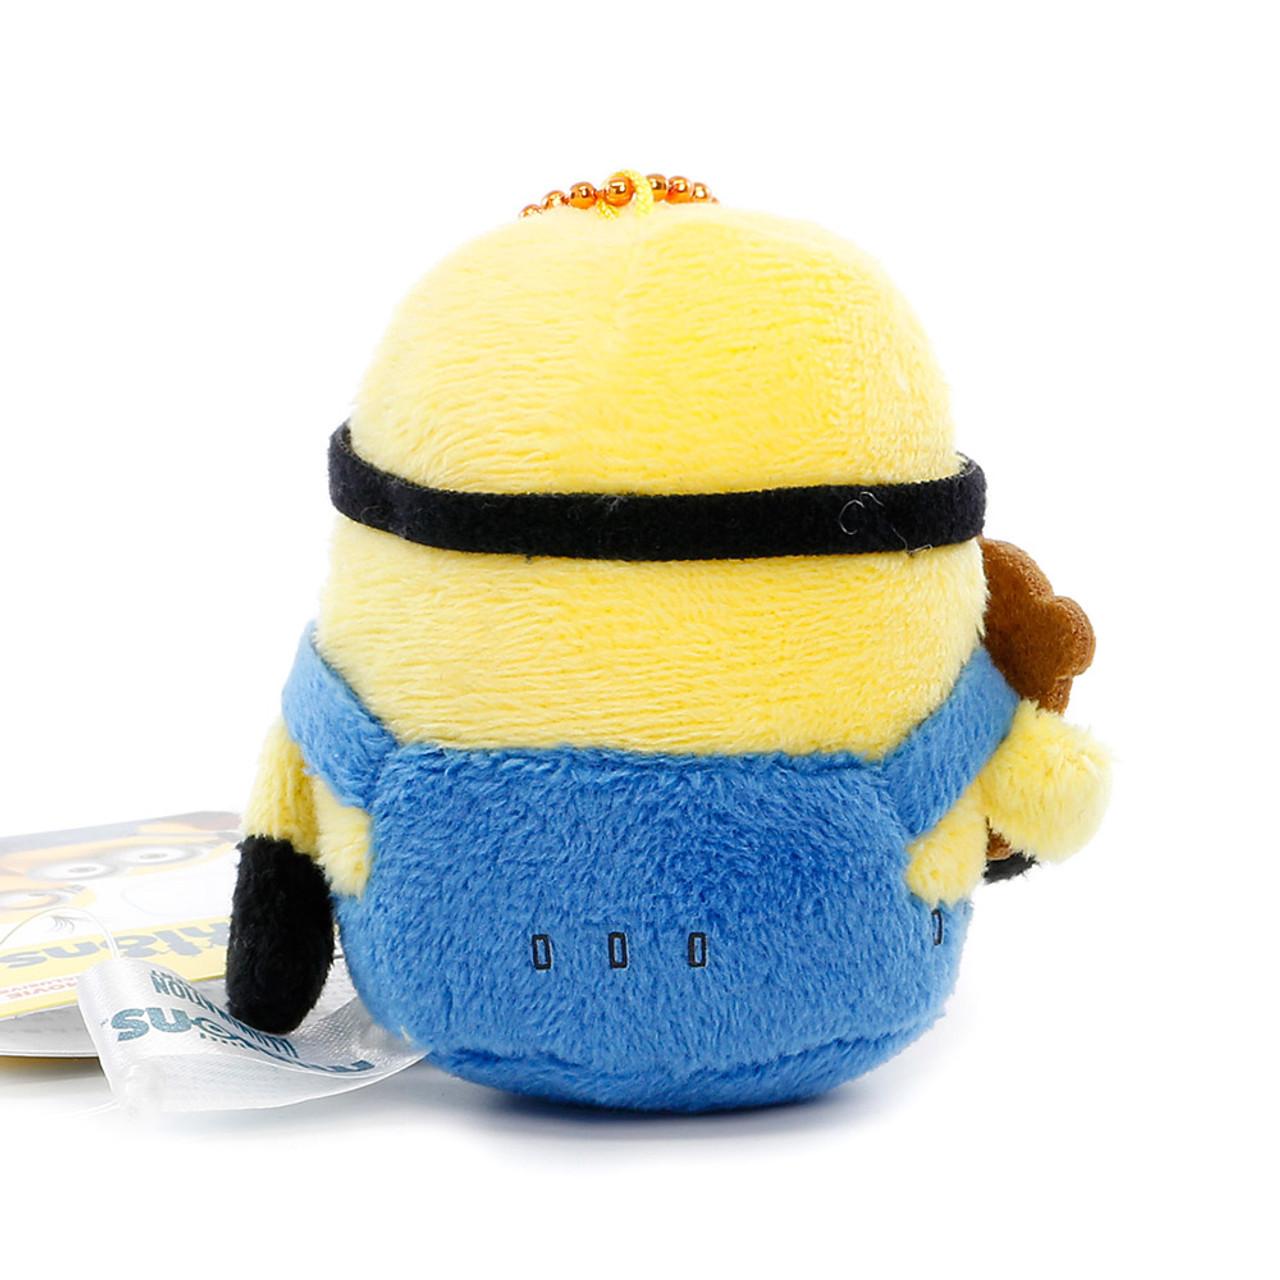 Bob The Minions Mascot Plush Doll Charms ( Back View )